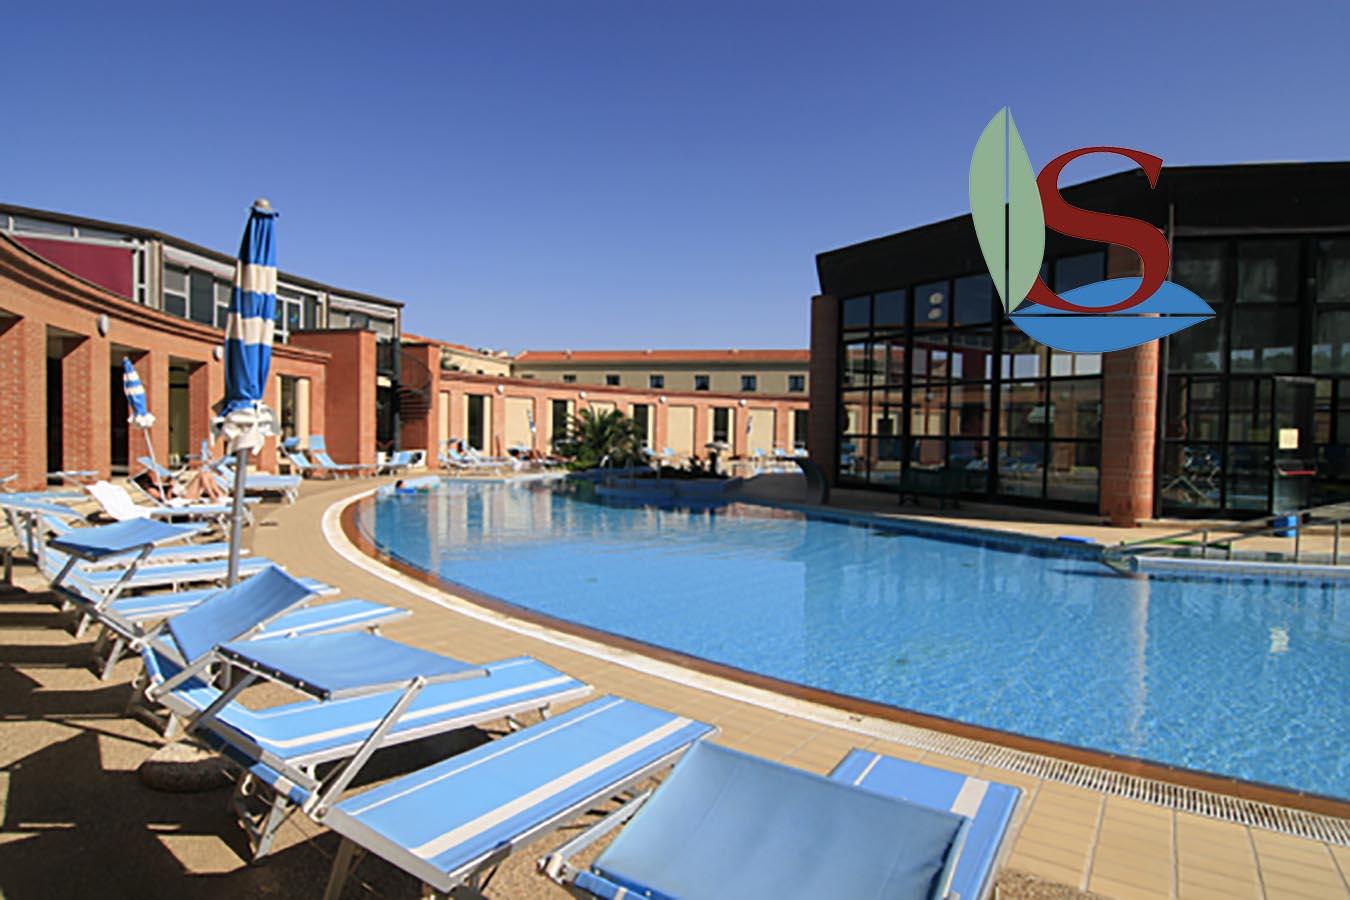 Hotel Eucalipti Terme Sardara (Ca)